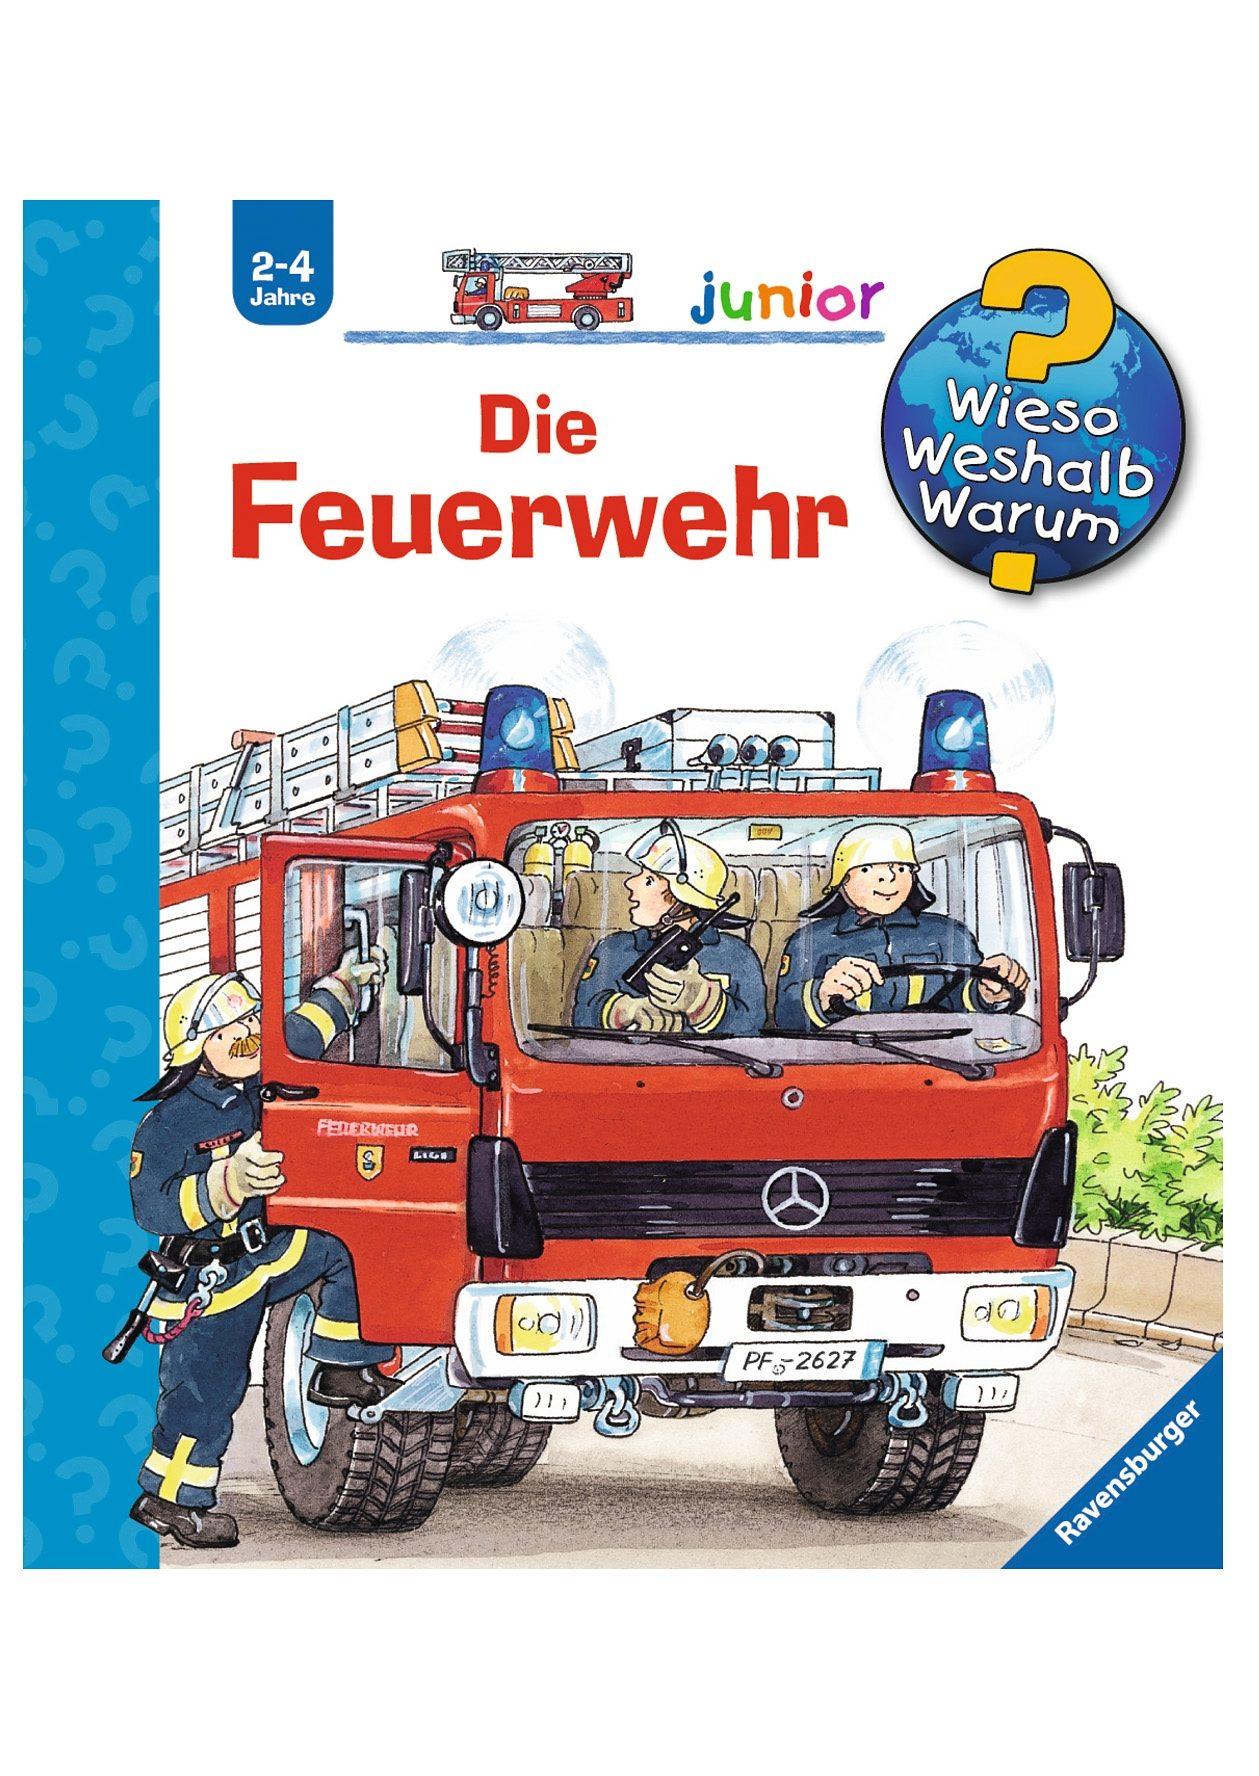 Ravensburger Kinderbuch, »Die Feuerwehr / Wieso? Weshalb? Warum? Junior®«